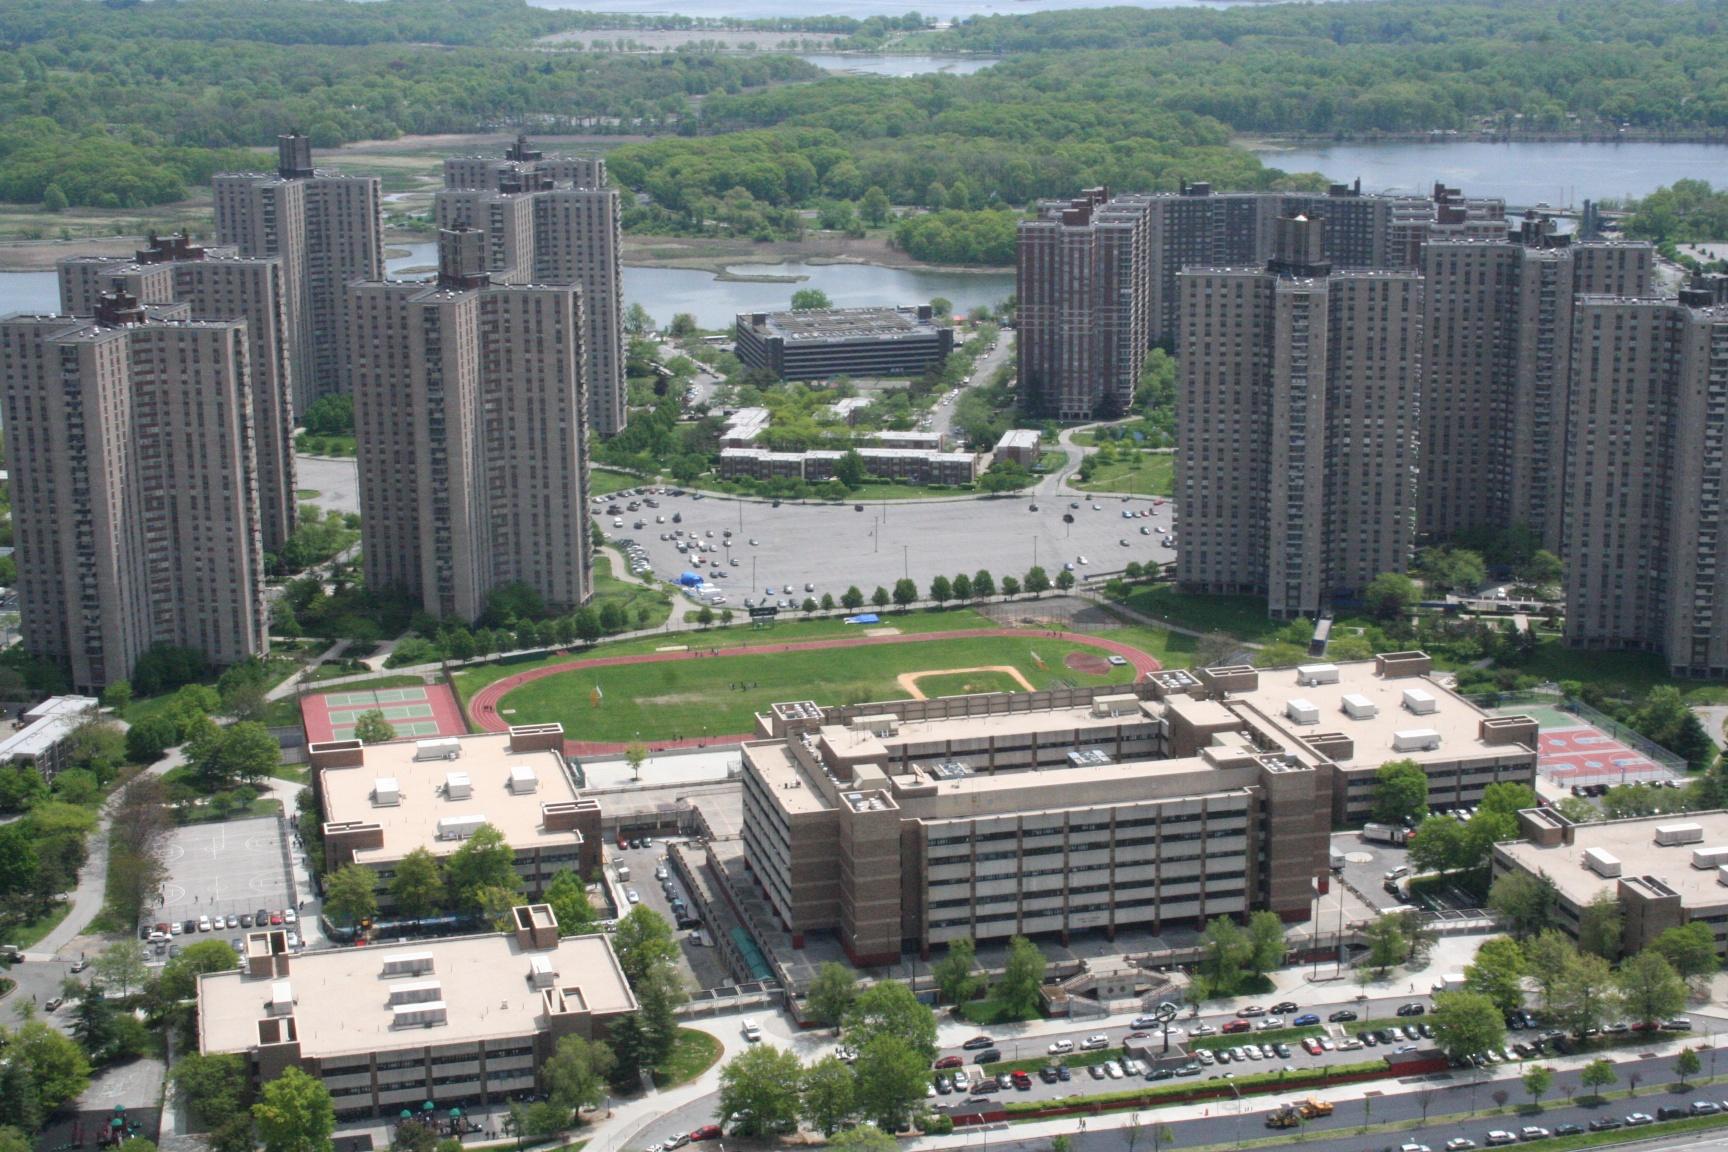 CoOp City Bronx 1970 UrbanHell